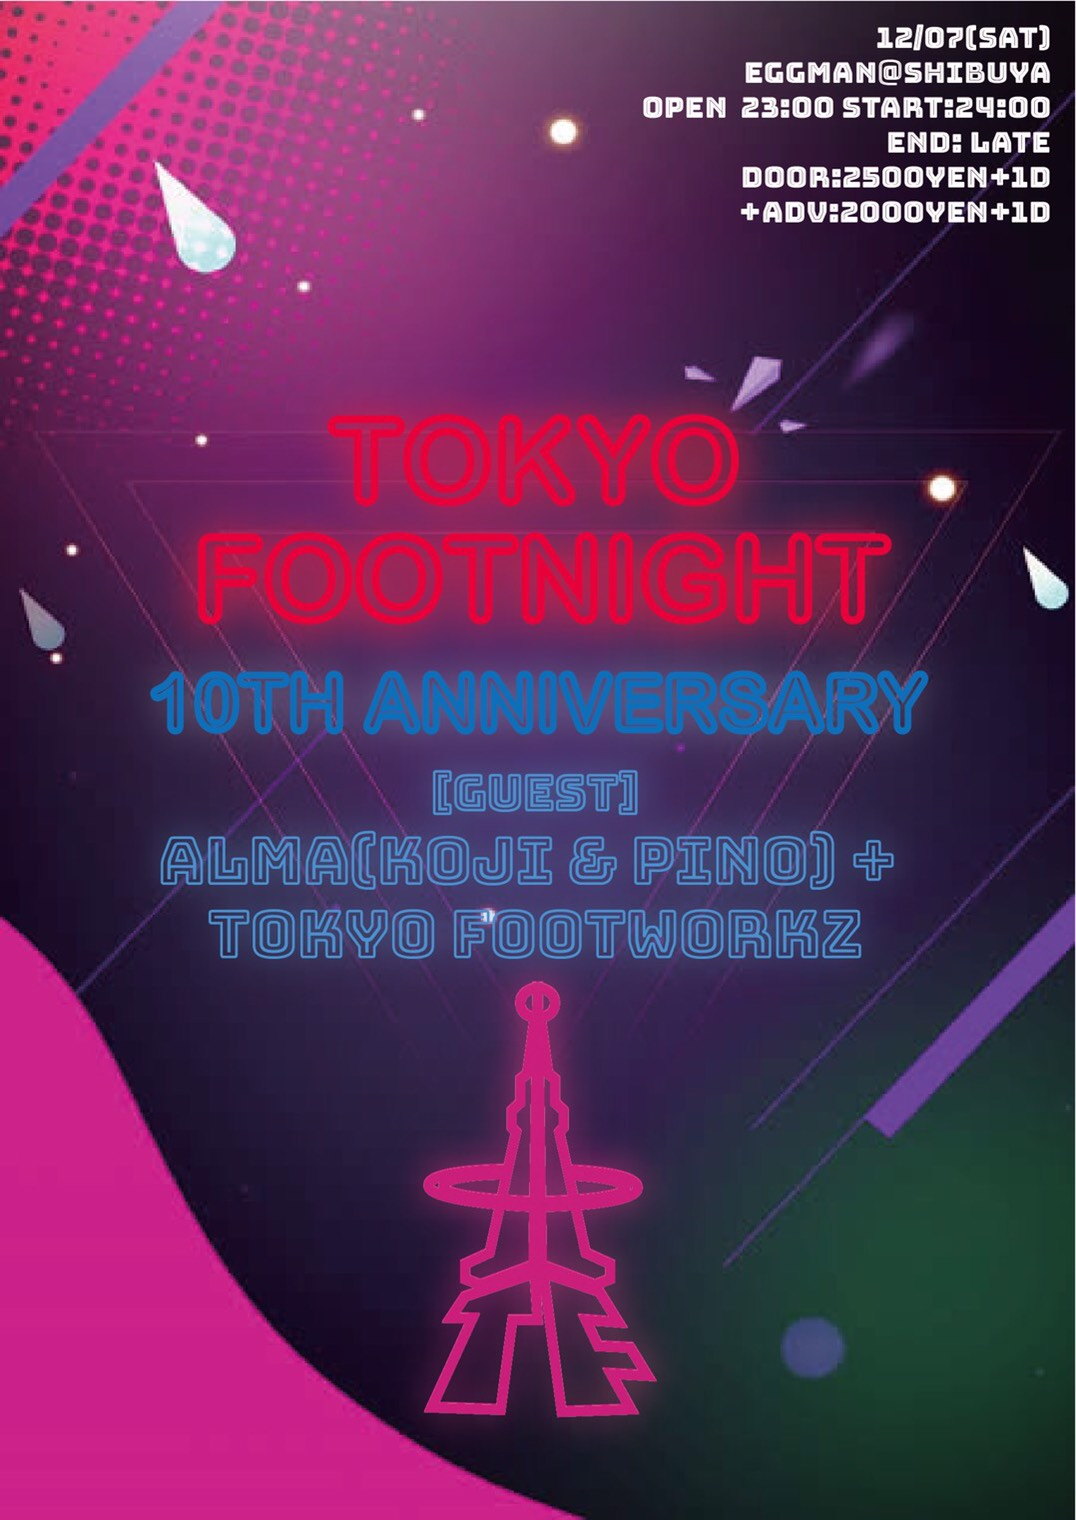 Tokyo Foot Night -10th ANNIVERSARY-